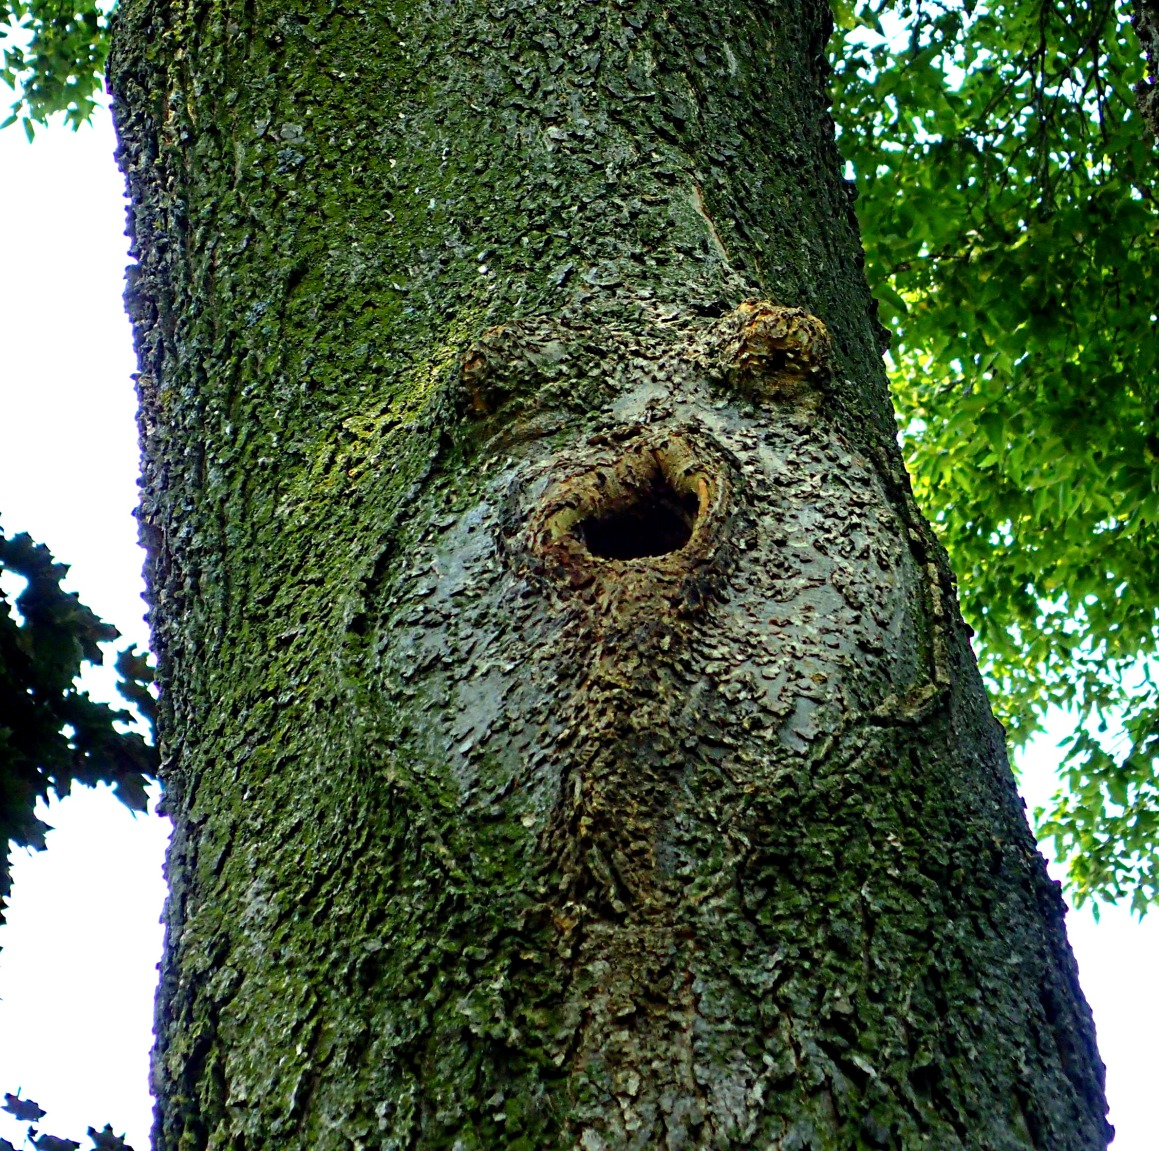 """Calling all tree huggers... I need a hug!""  Photo by Thomas Peace 2014"